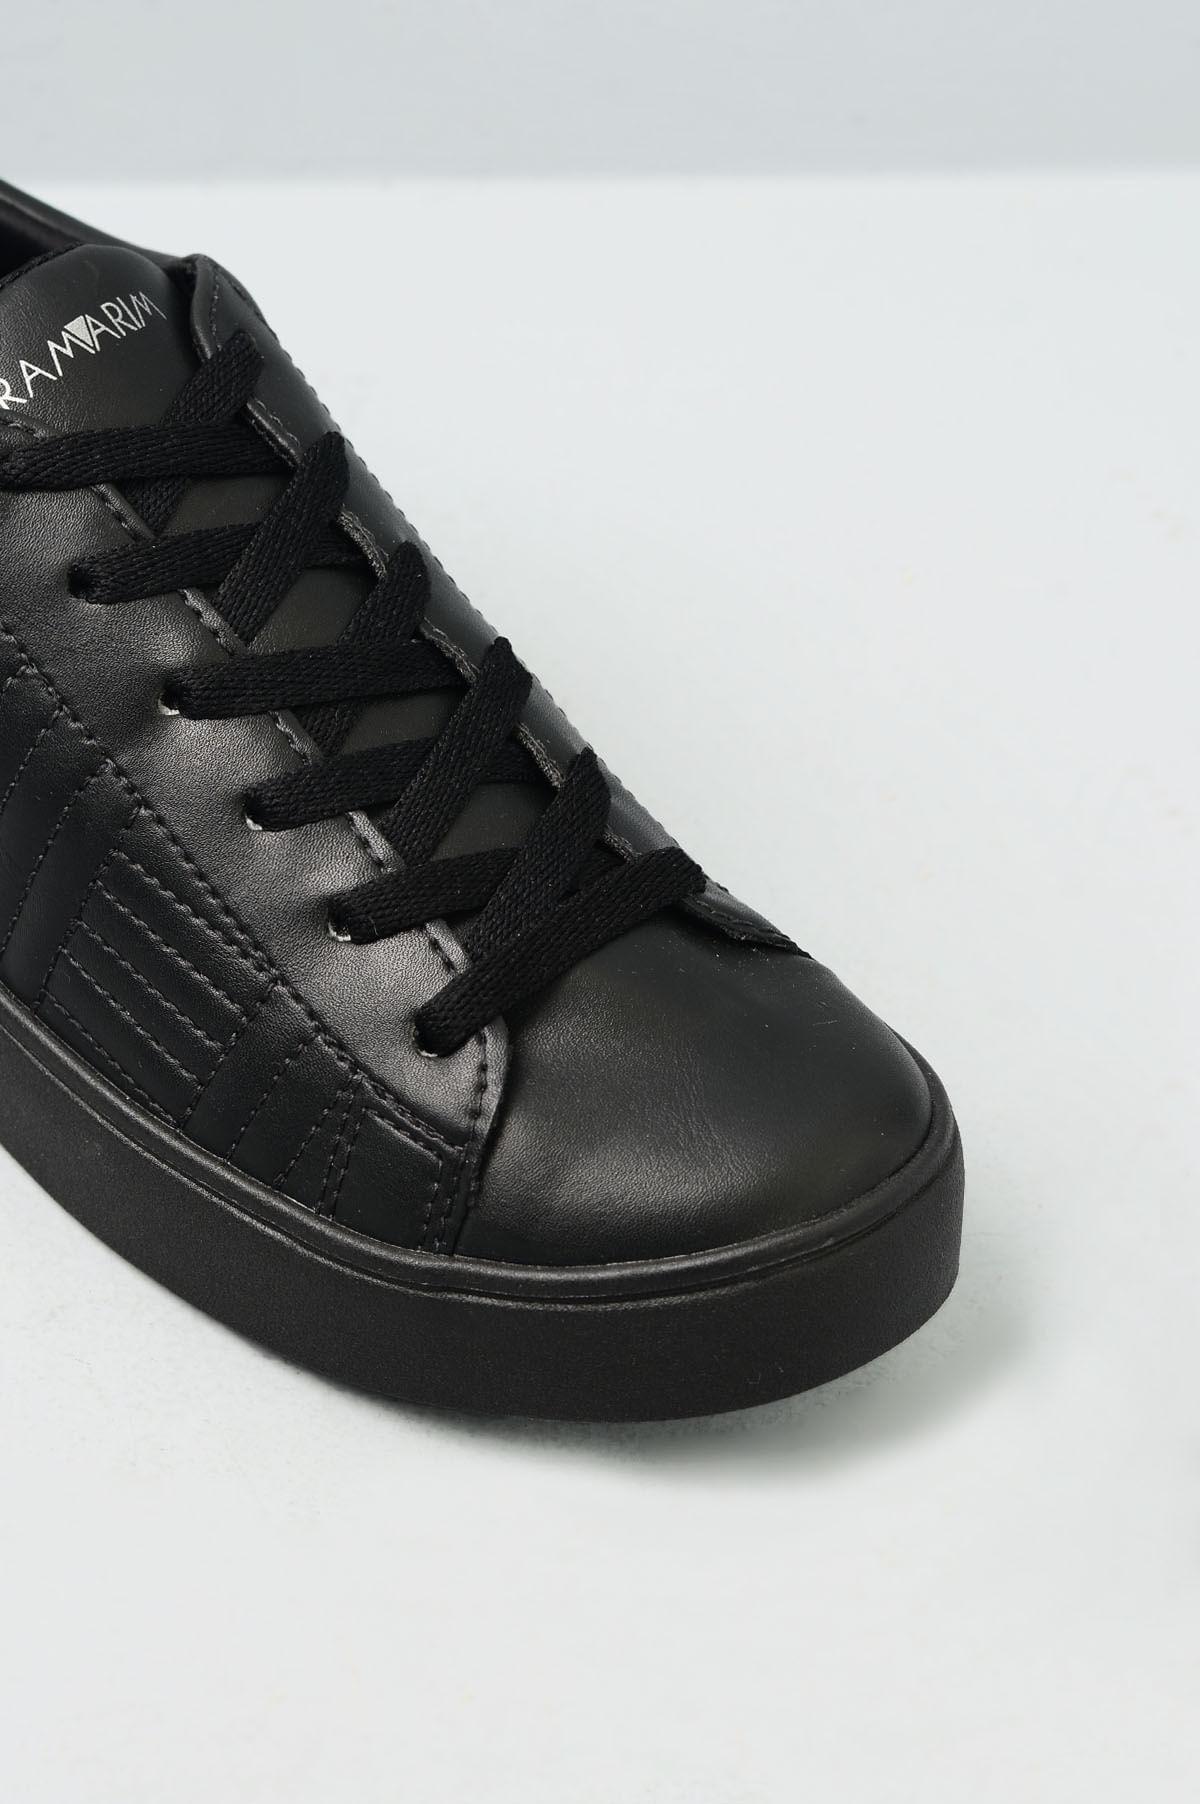 f71b8baa6b Tênis Feminino Plataforma Foster Ramarim SINT - PRETO - Mundial Calçados